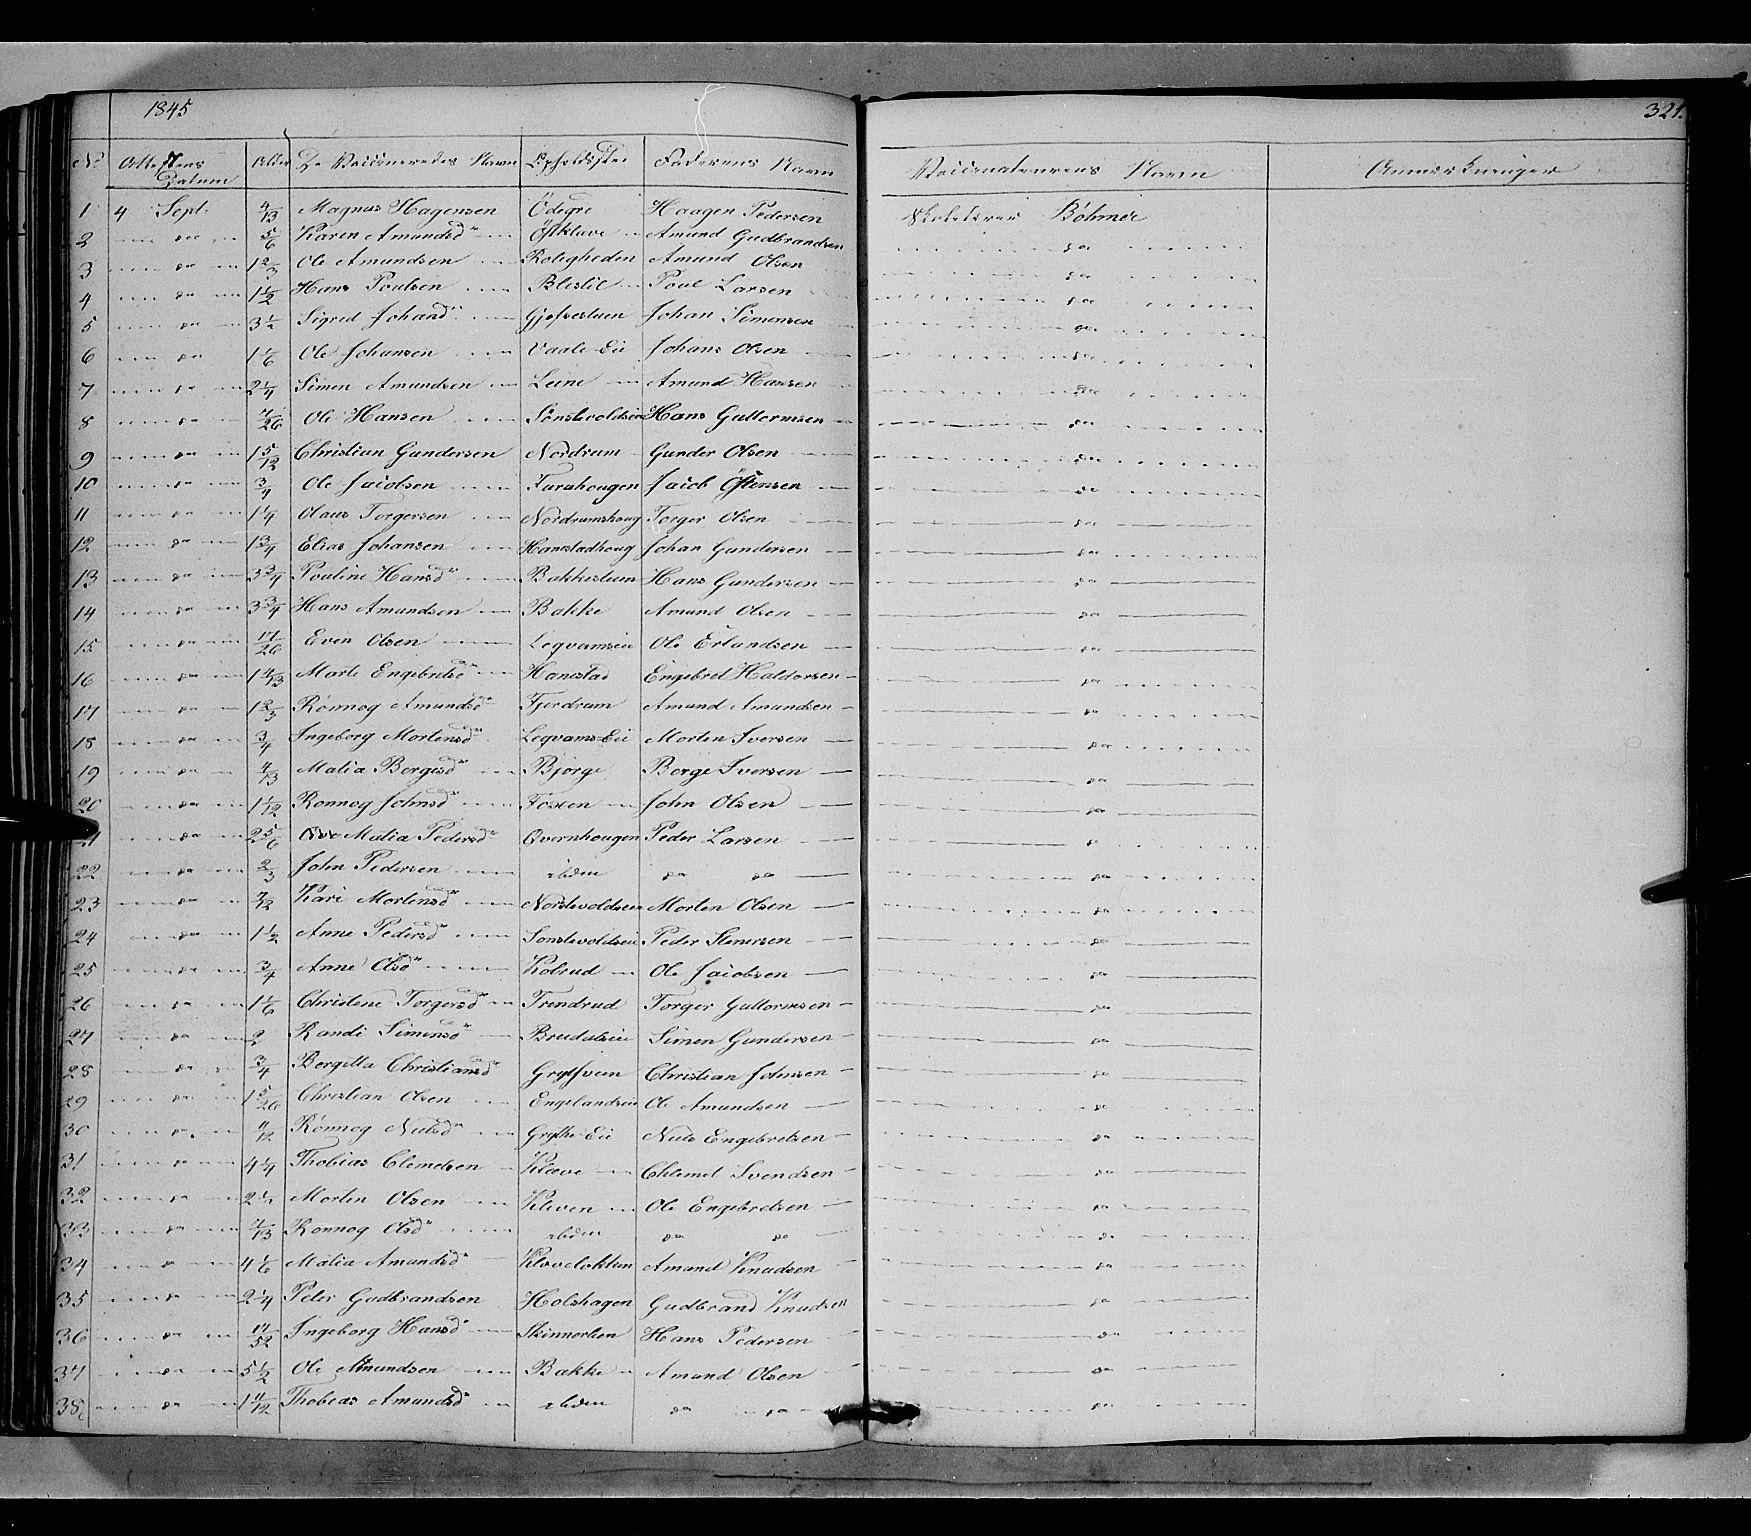 SAH, Gausdal prestekontor, Ministerialbok nr. 7, 1840-1850, s. 321